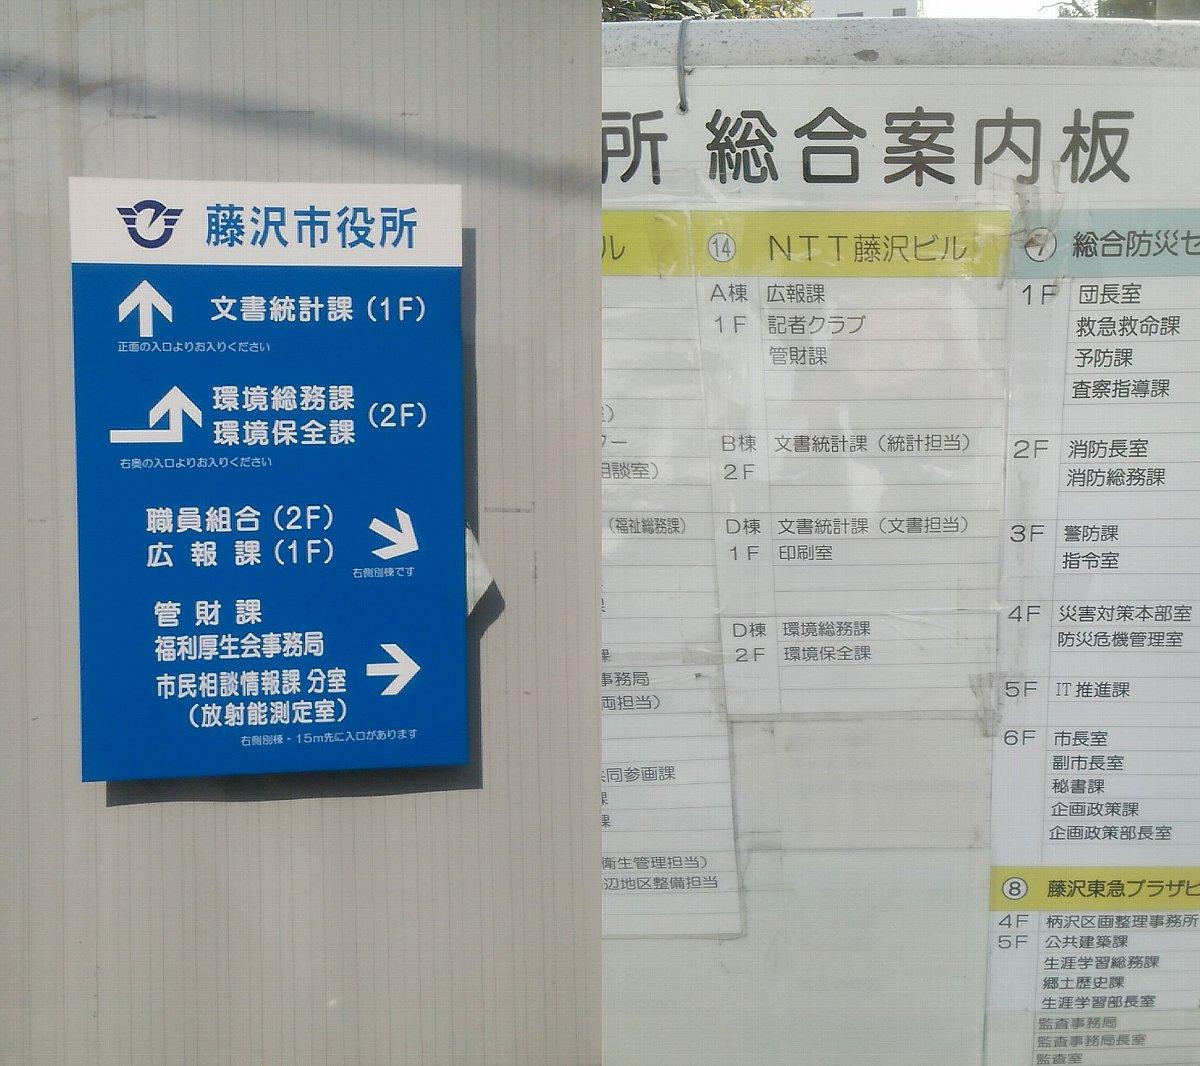 http://fujikama.coolblog.jp/2015/SEP/20151025.jpg